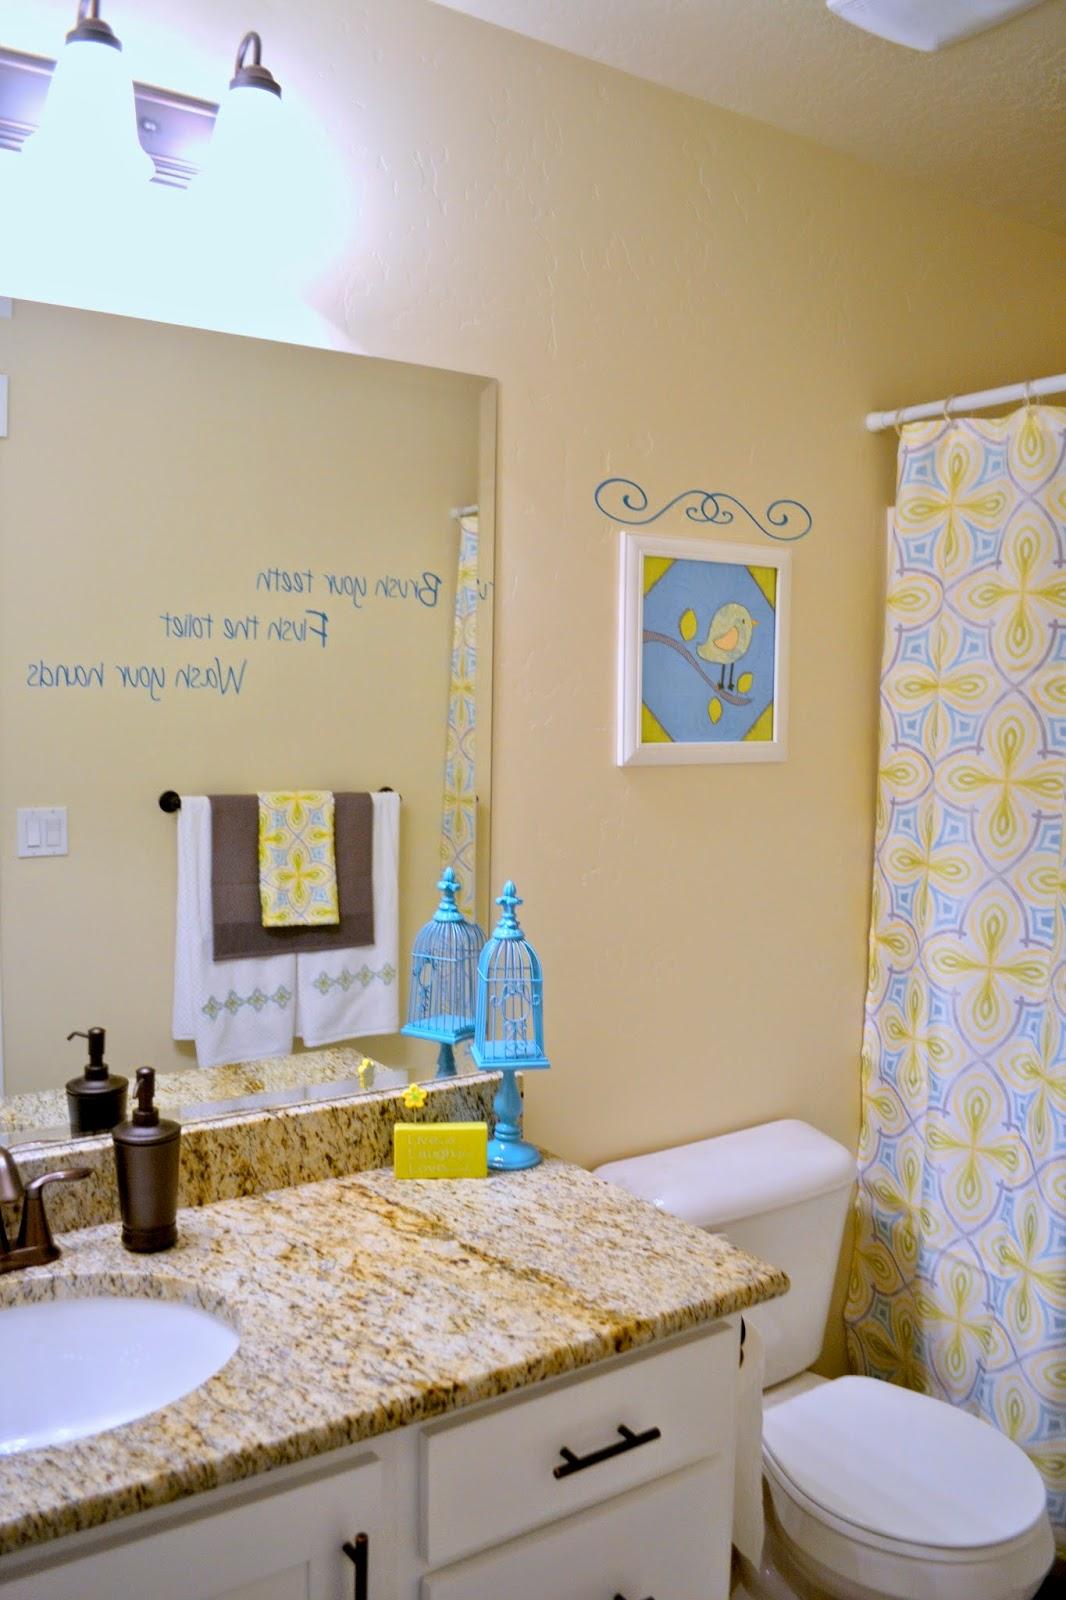 5x7 bathroom design small full bathroom plan small for Bathroom 5x7 design